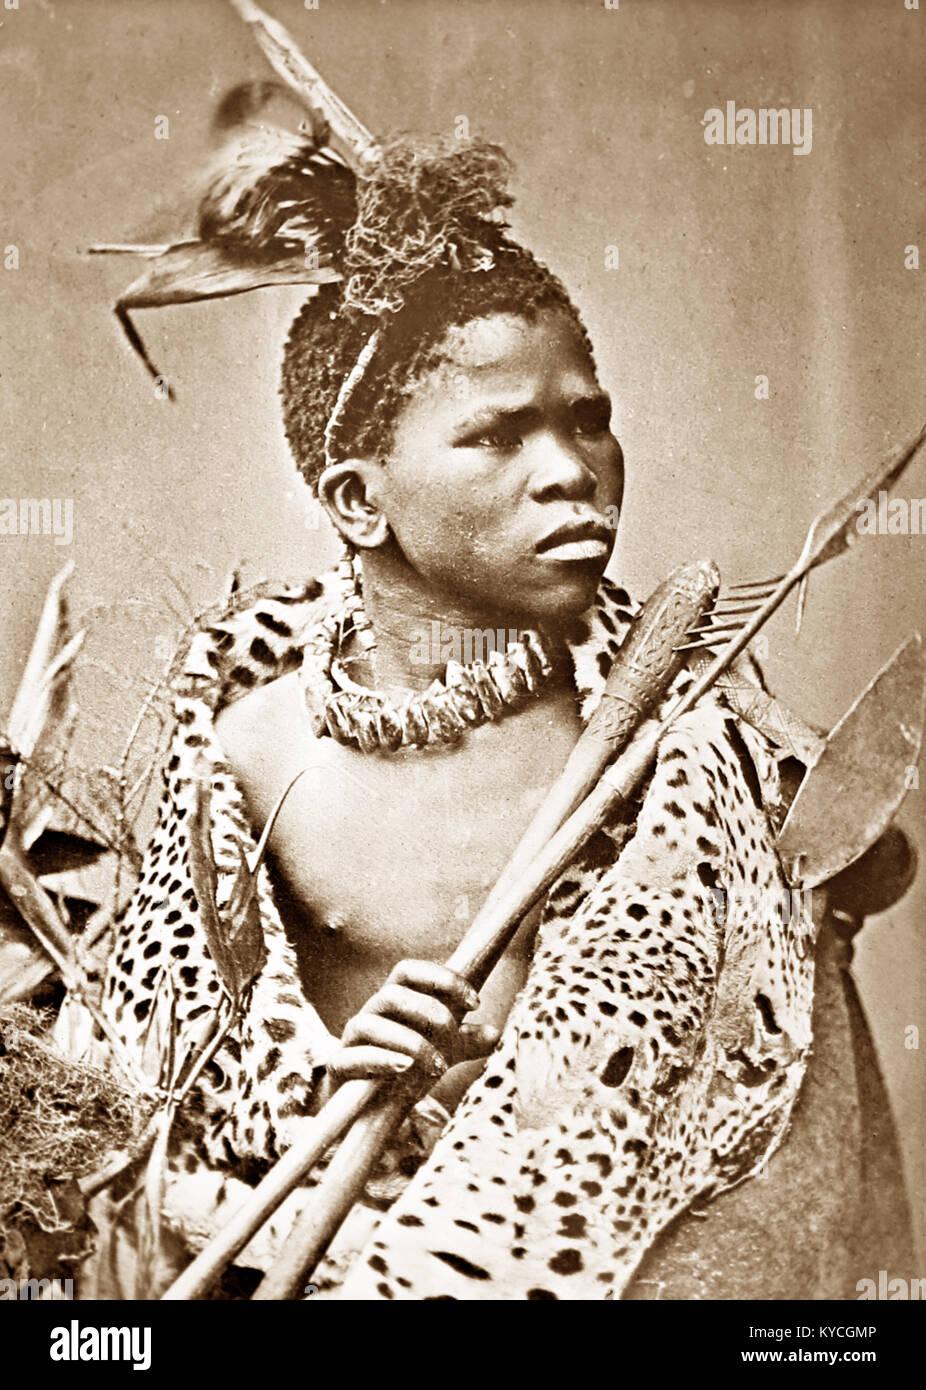 A Zulu Warrior, Victorian period - Stock Image